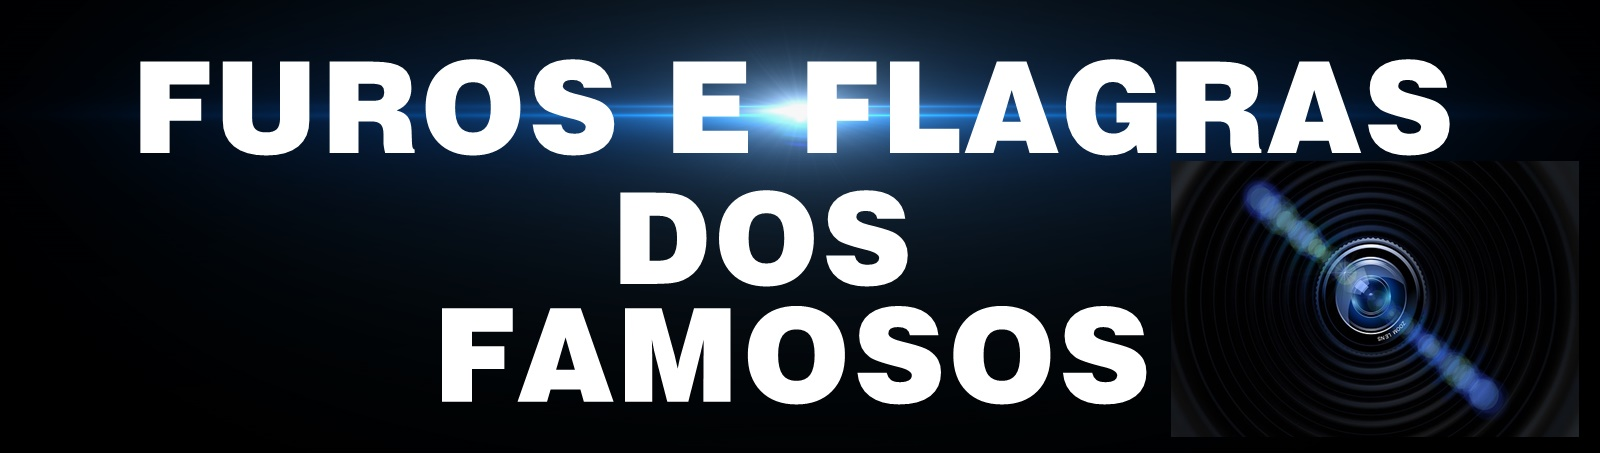 FUROS E FLAGRAS DOS FAMOSOS